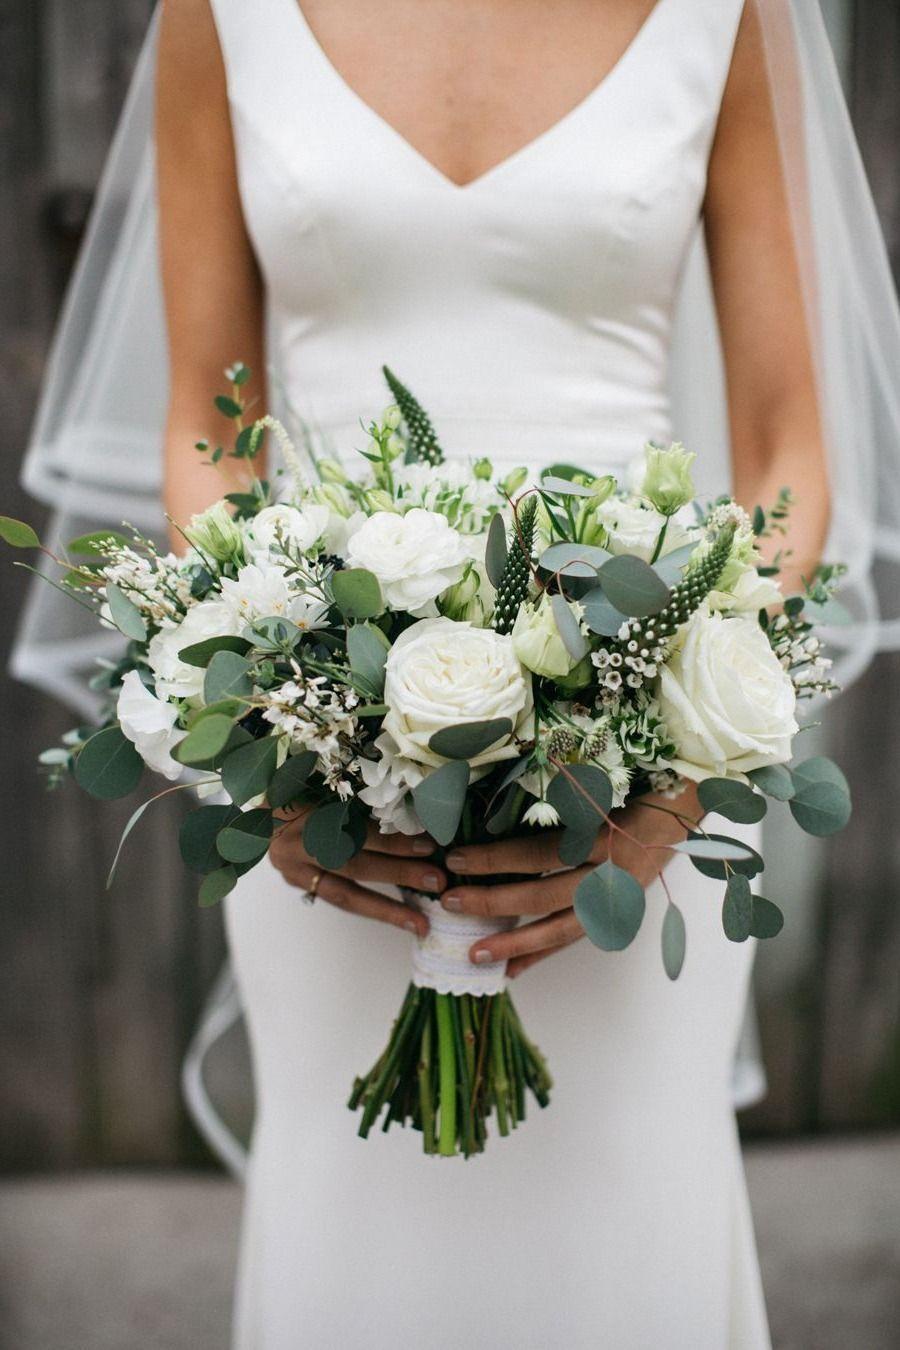 Elegant white and greenery wedding bouquets wedding